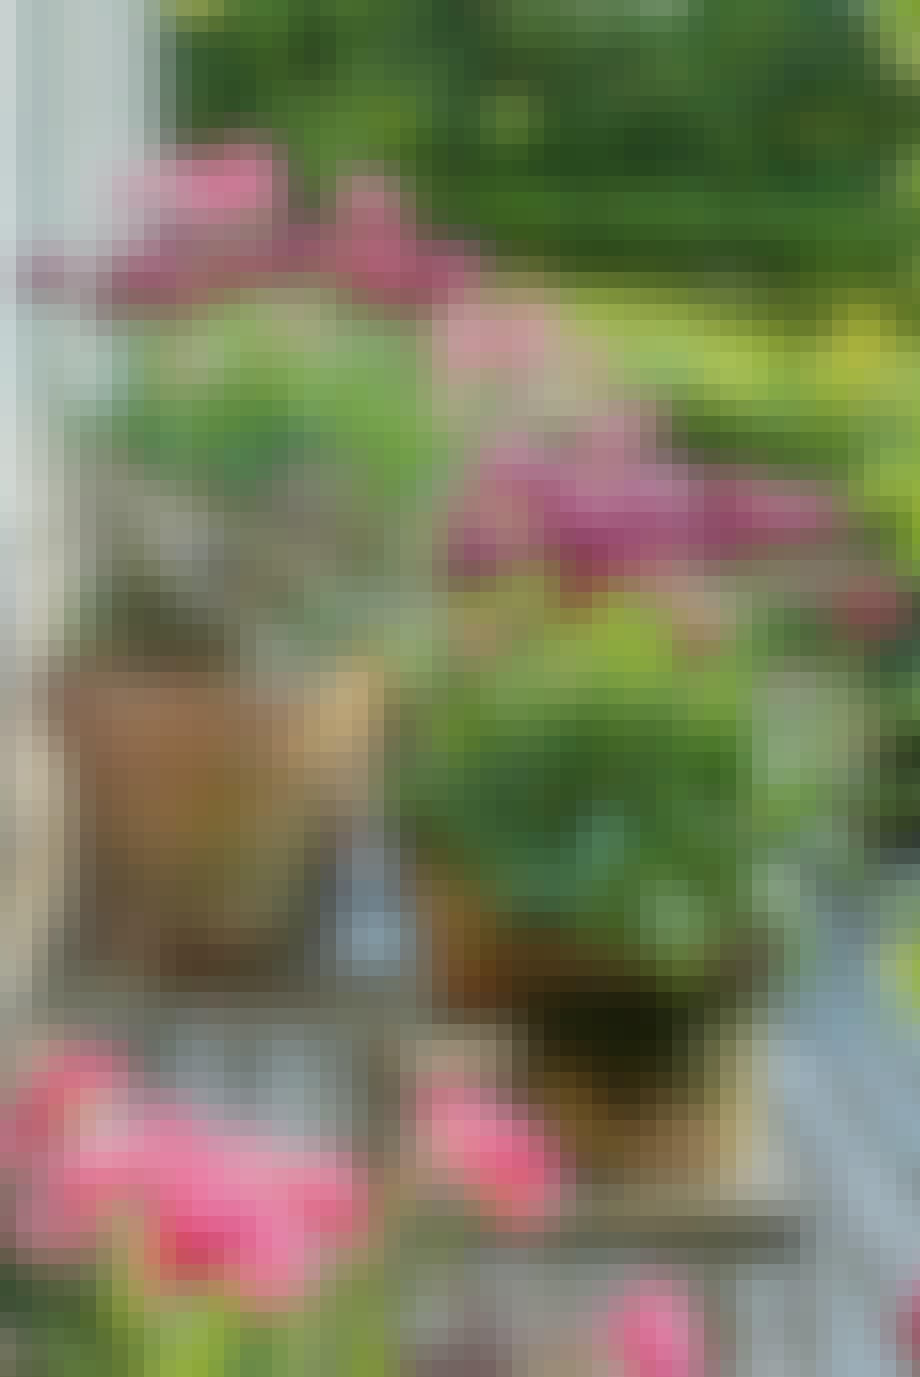 Tulipaner i lilla og lyserød nuancer i potter og krukker